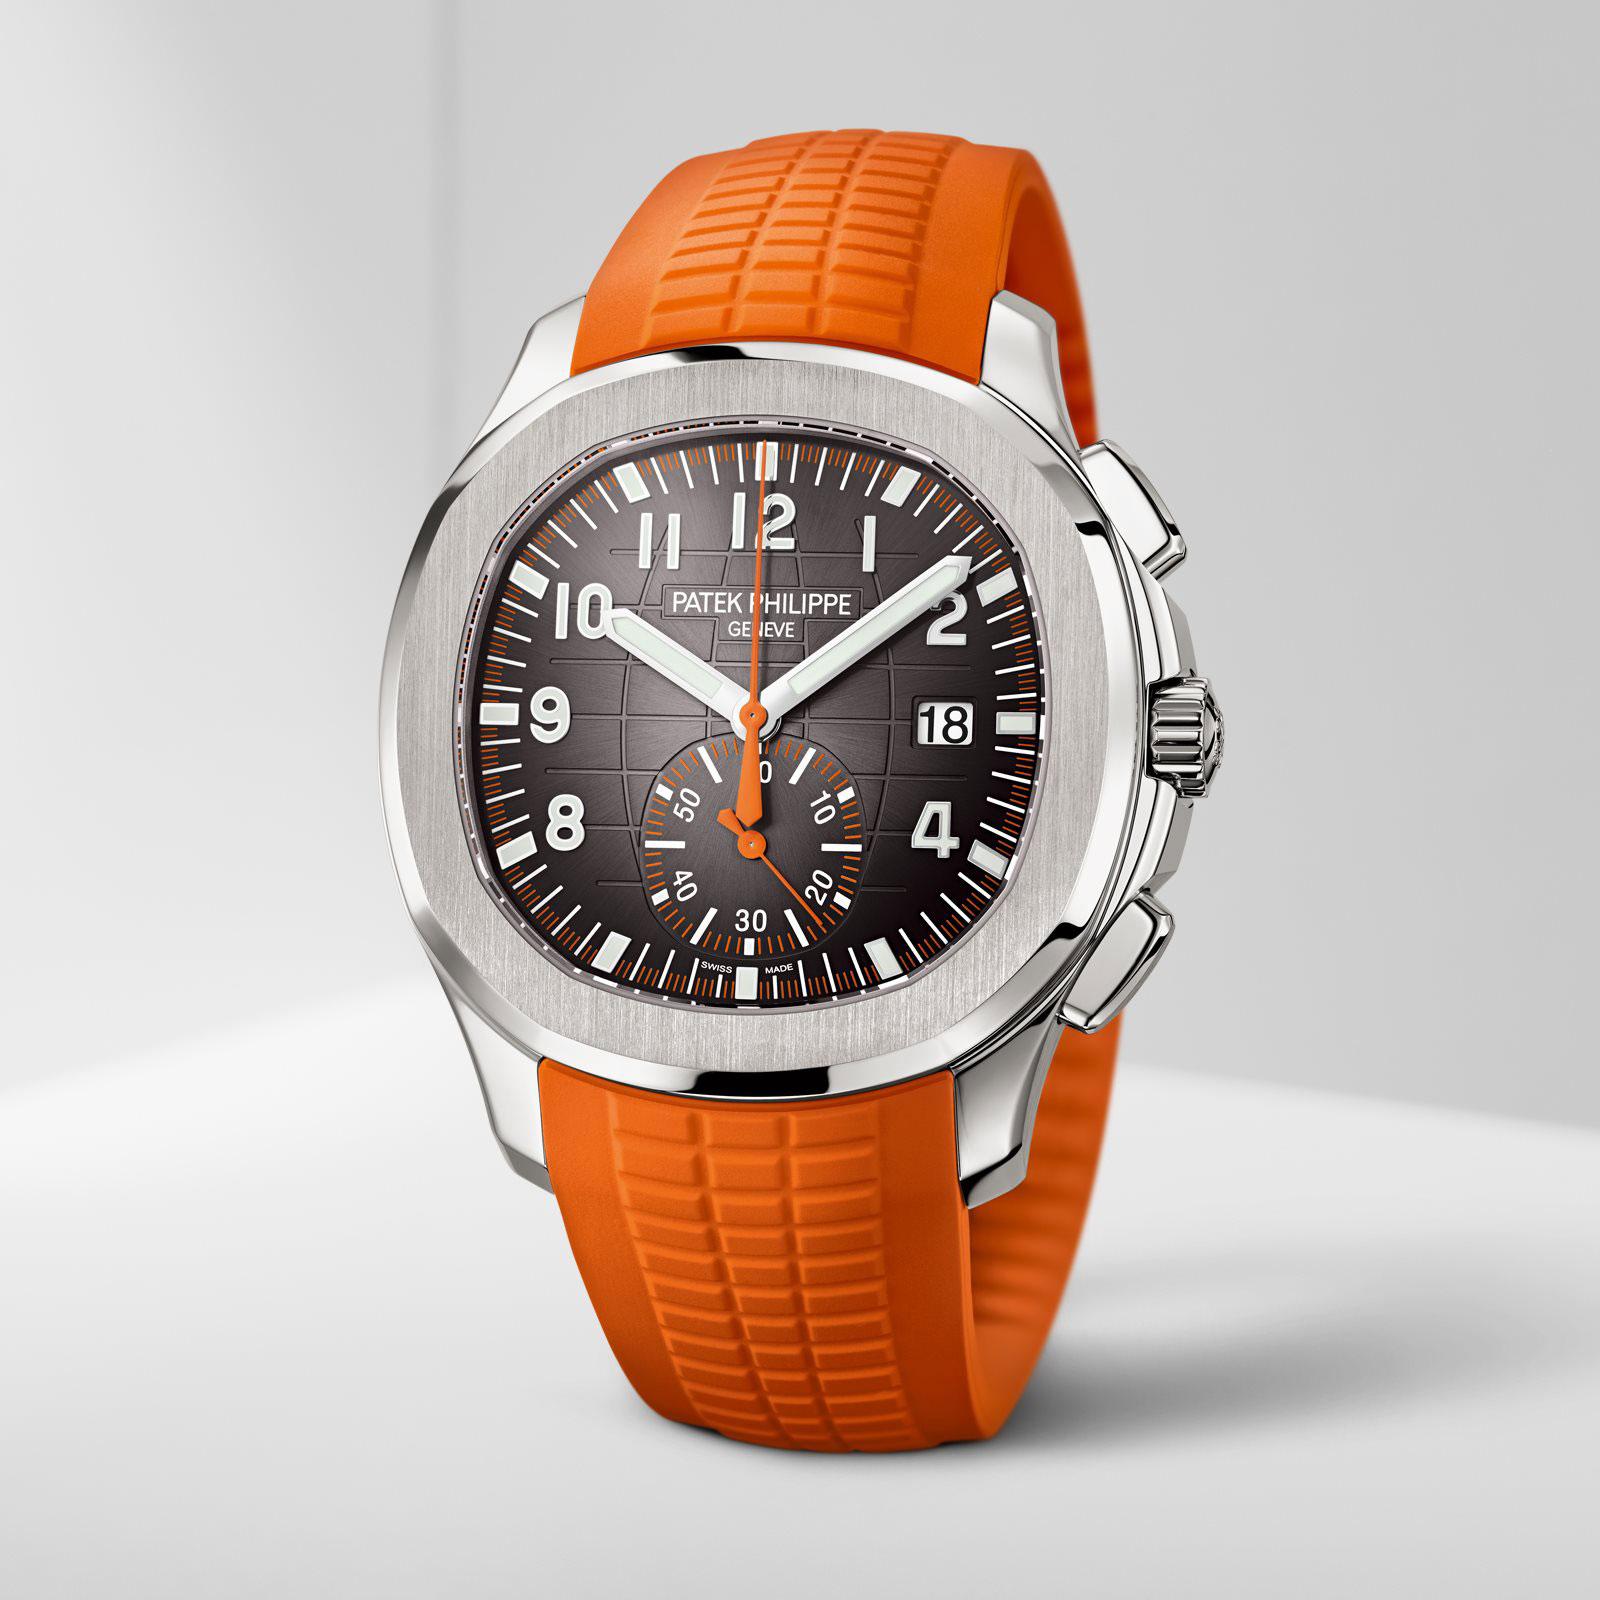 Patek Philippe Aquanaut Chronograph Ref. 5968A 4